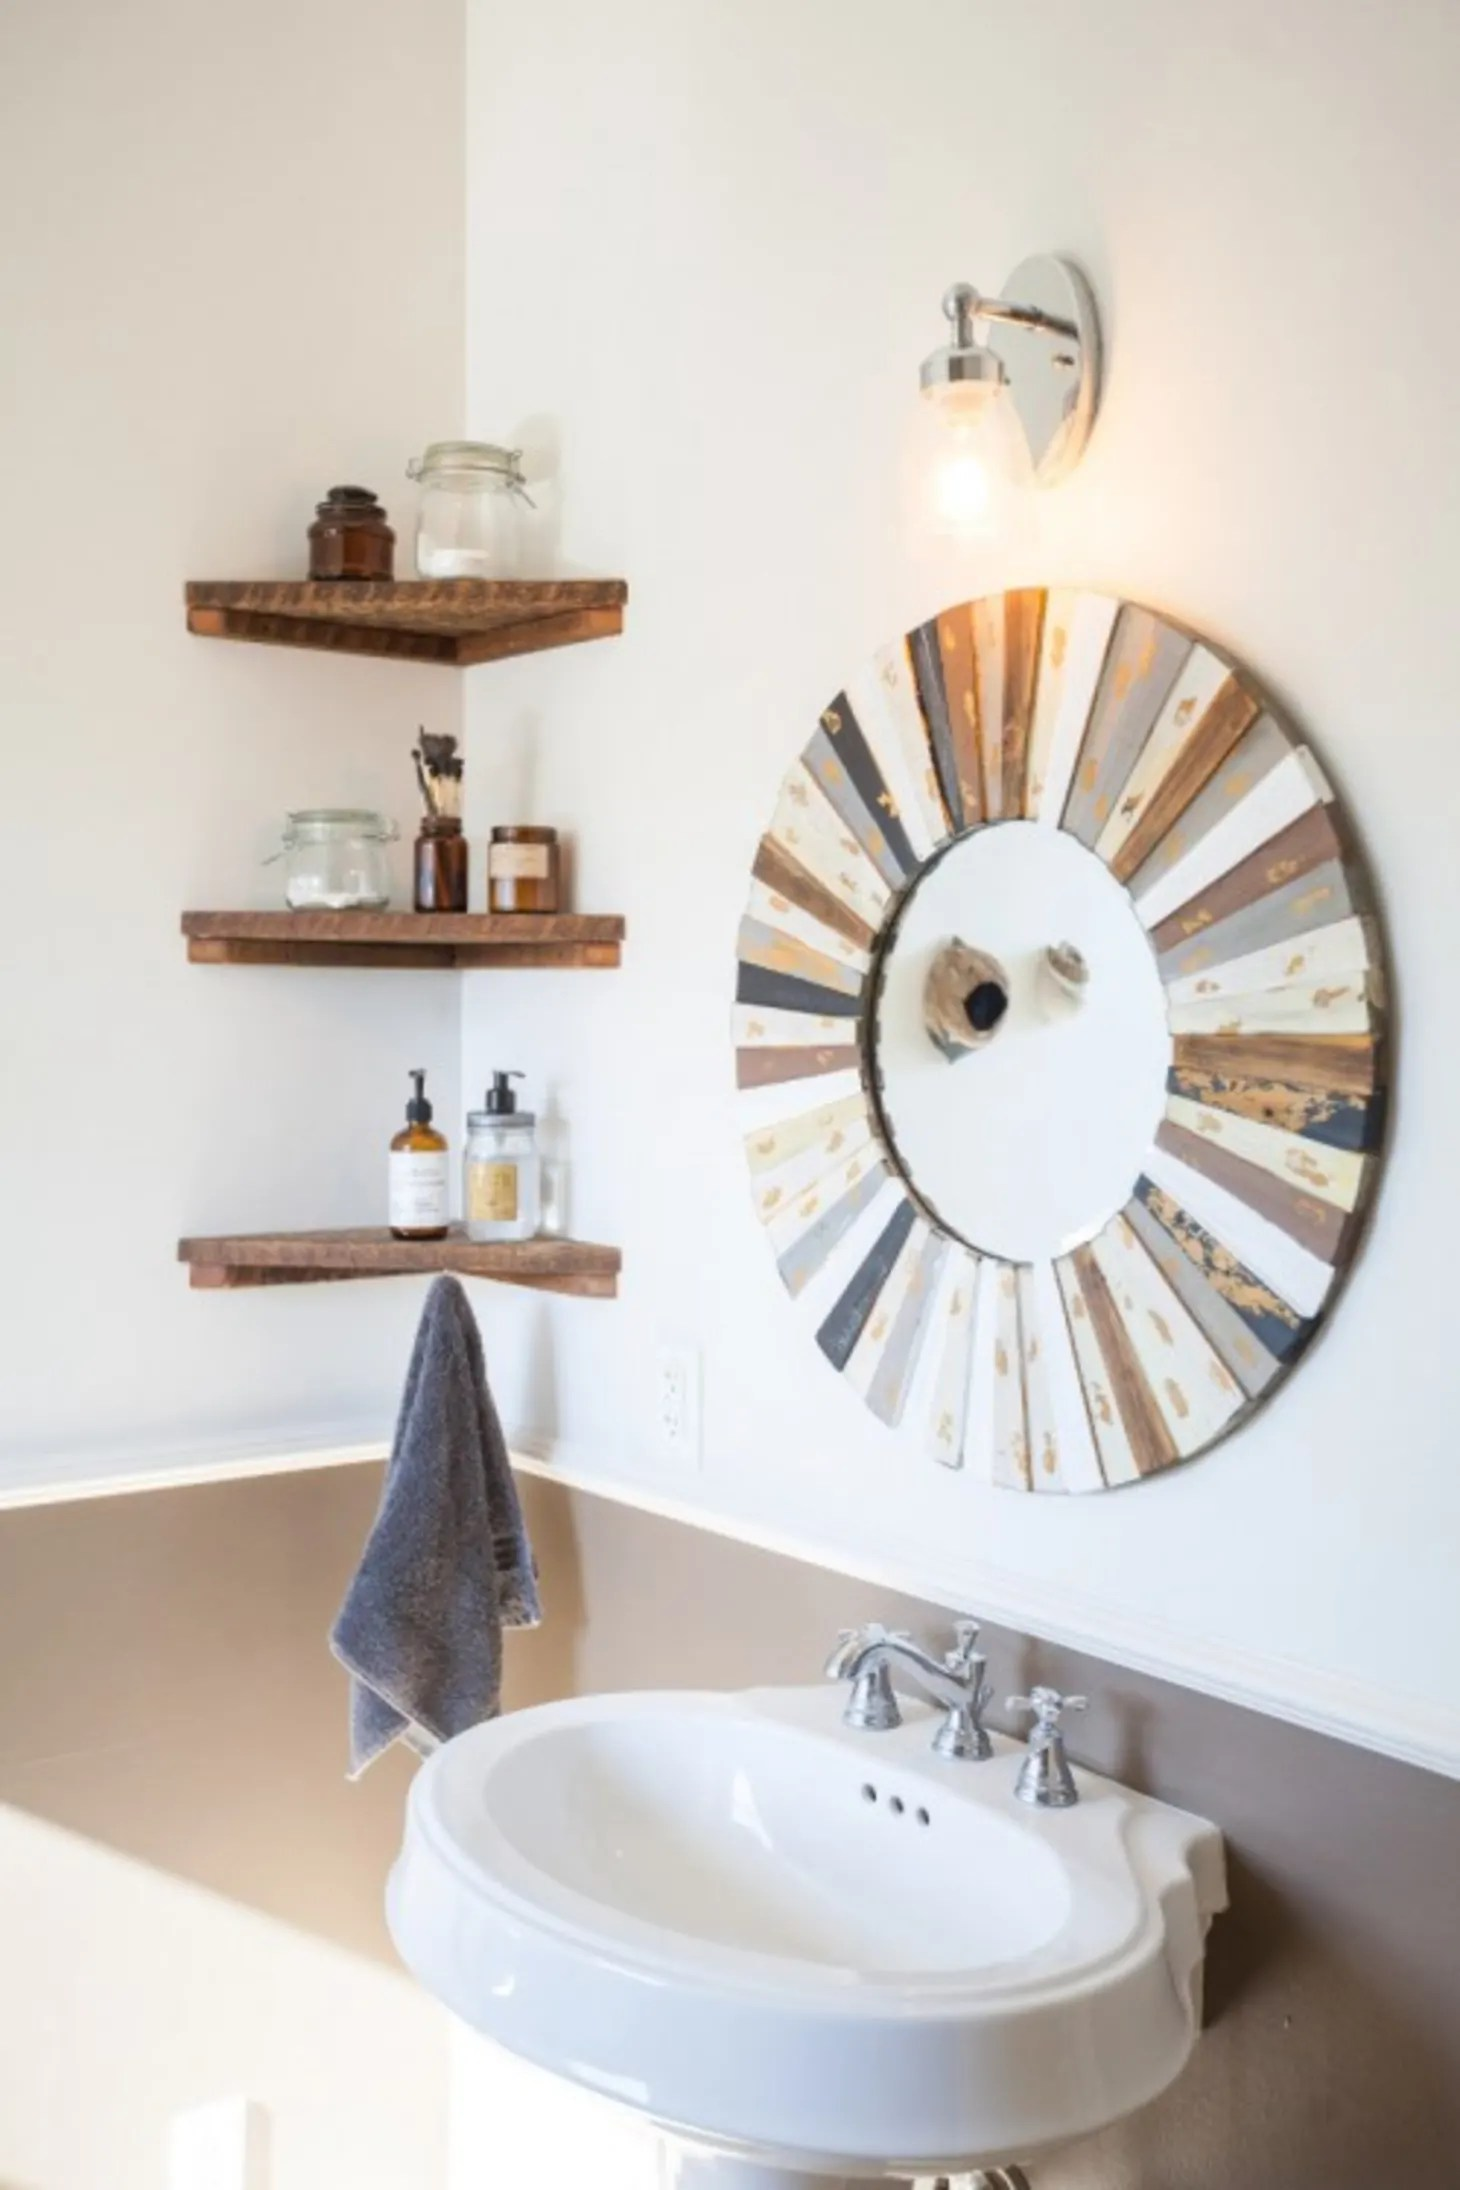 Small Bathroom Best Wall Shelves Storage Ideas | Apartment ... on Small Apartment Bathroom Storage Ideas  id=49423